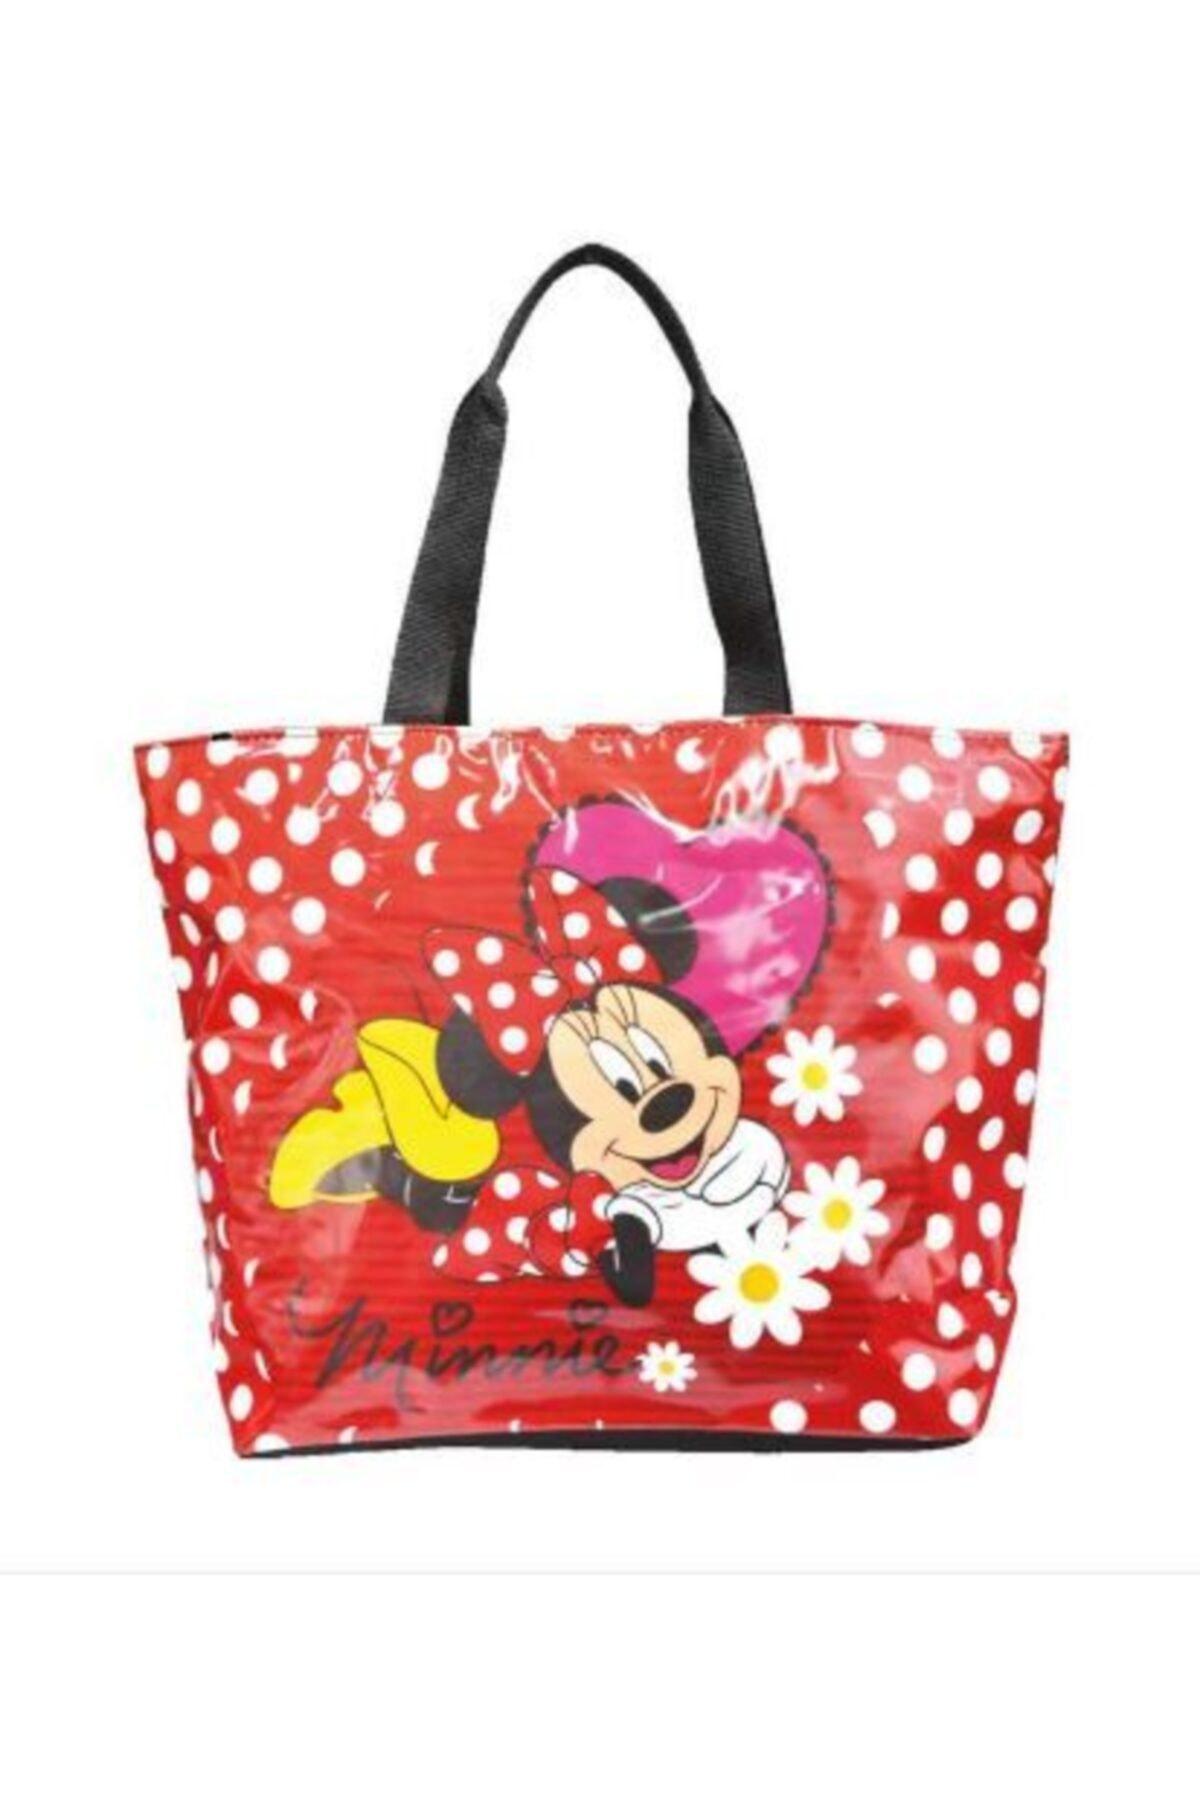 Disney Mickey Mouse Minnie Mouse Lisanslı Plaj Çantası Minnie-Mouse 1